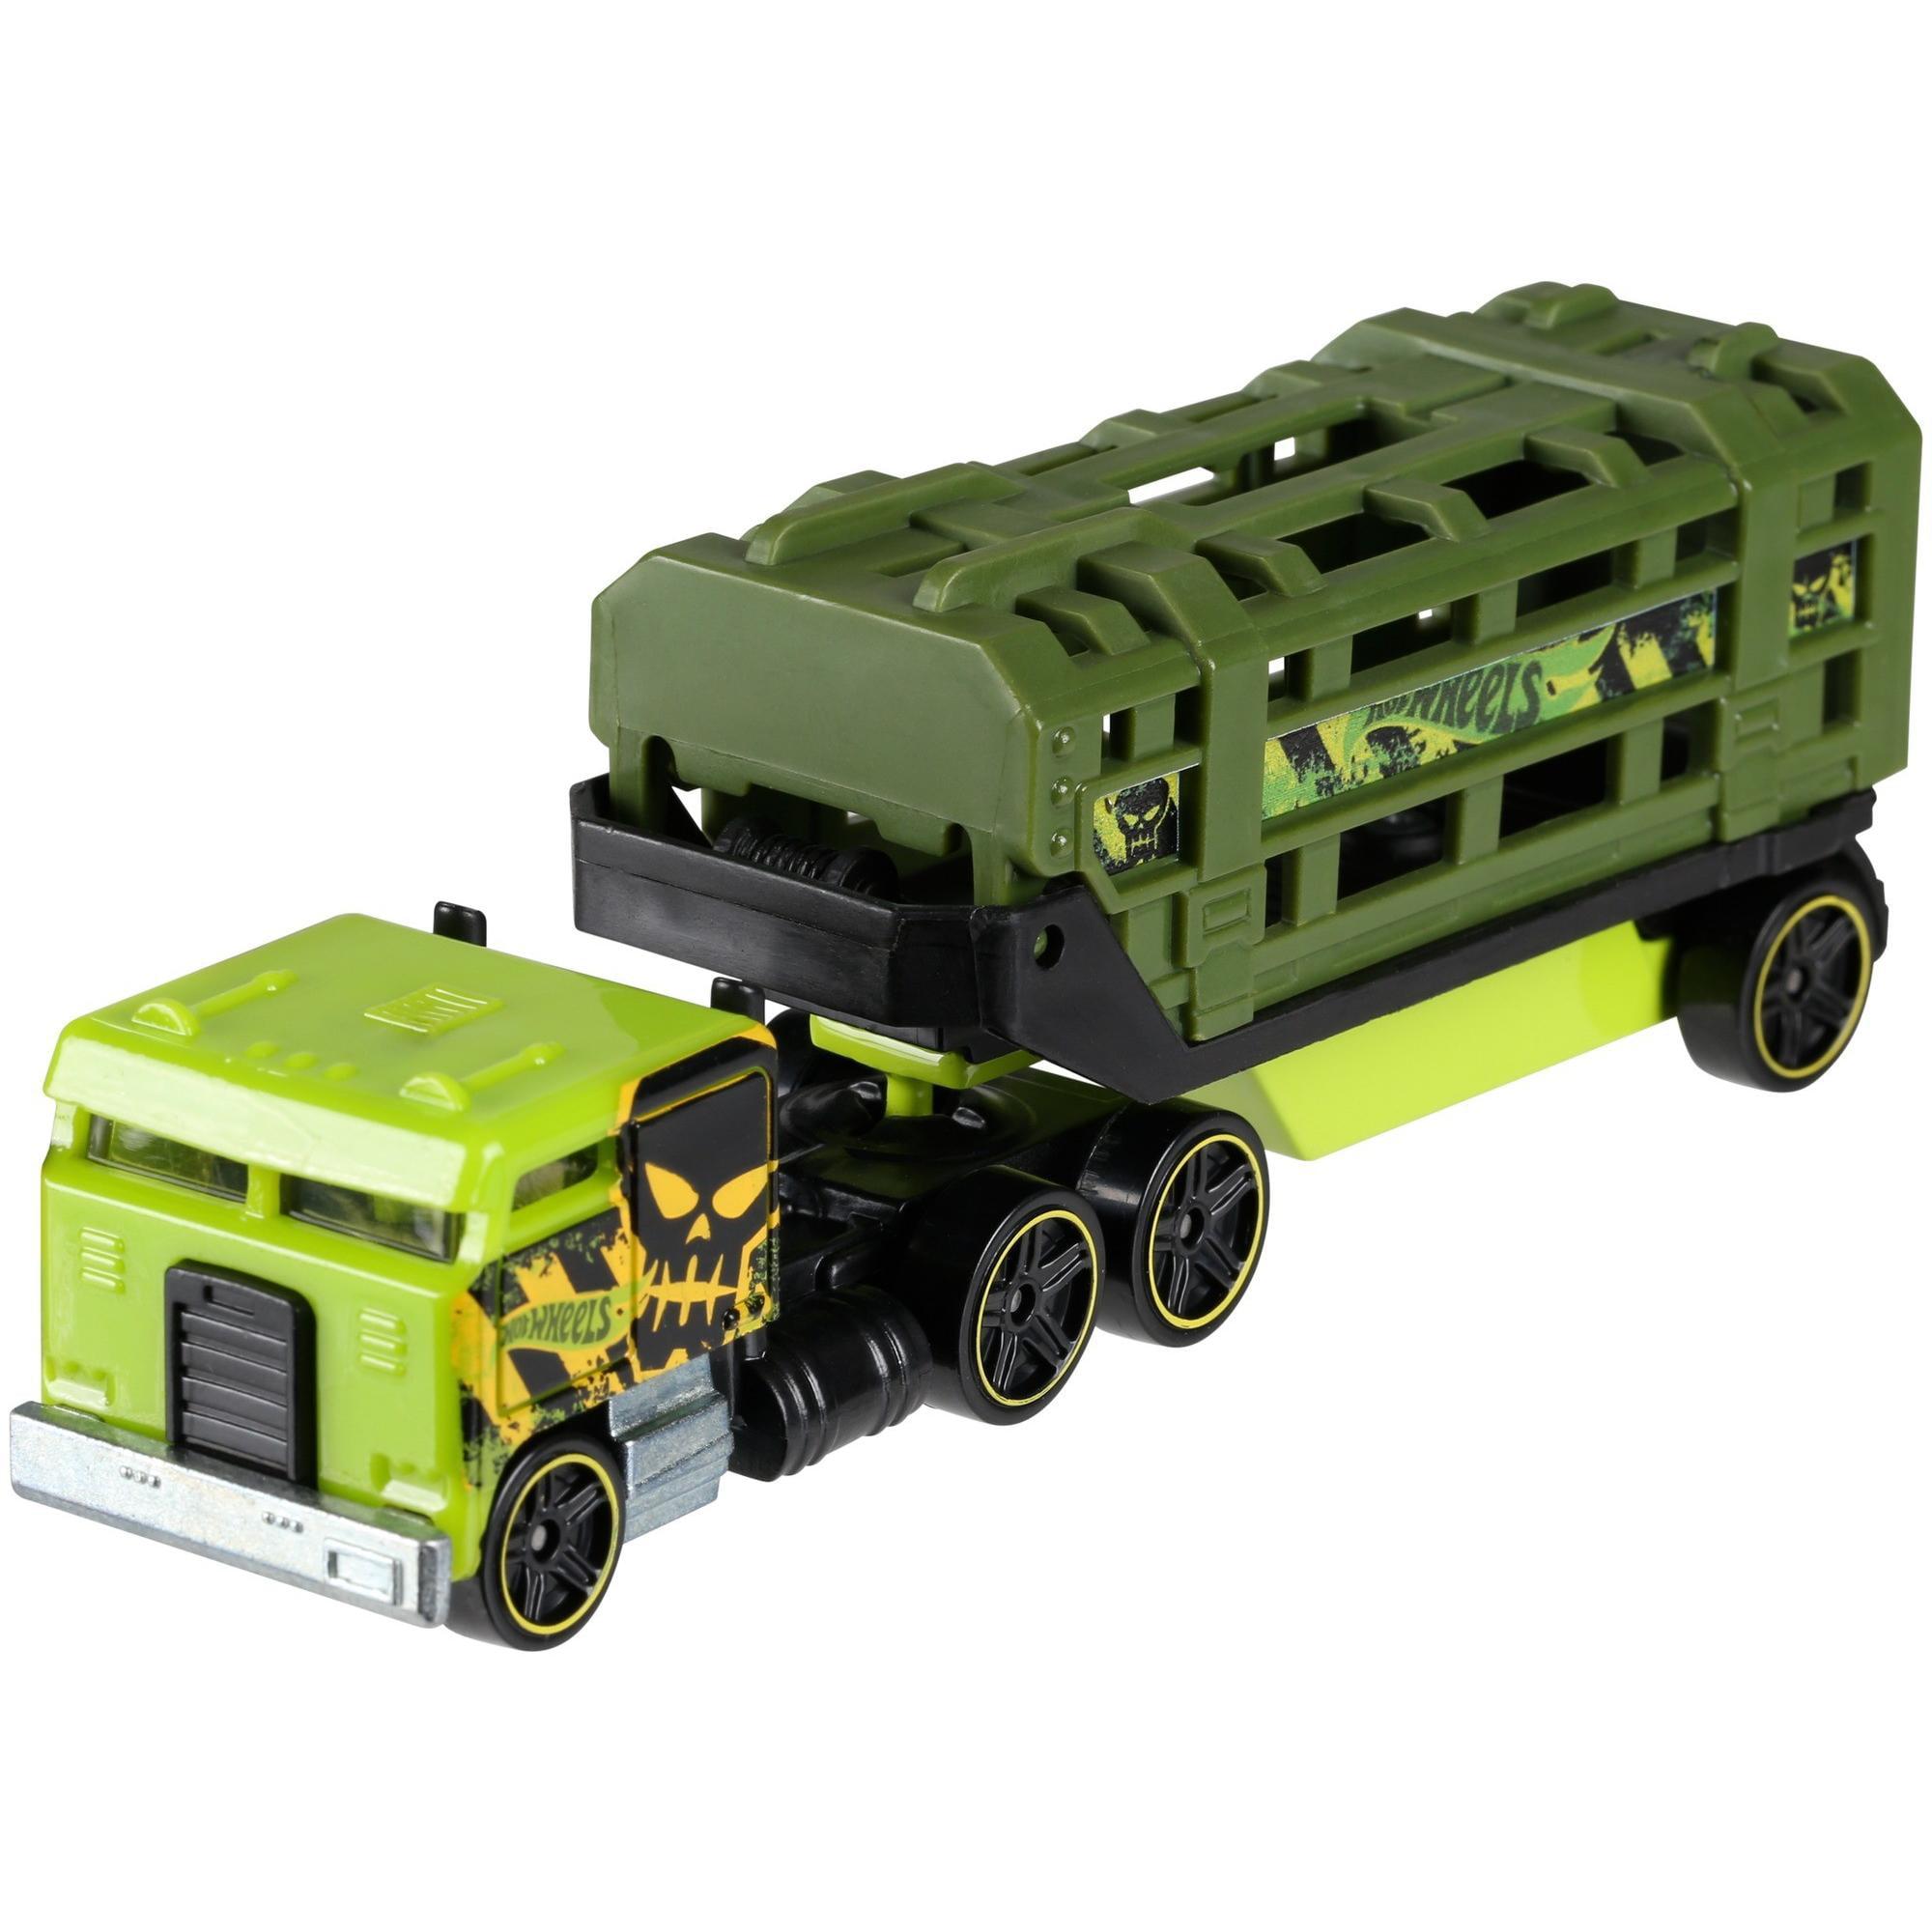 Hot Wheels Track Trucks (Item May Vary) by Mattel U.K. Ltd.